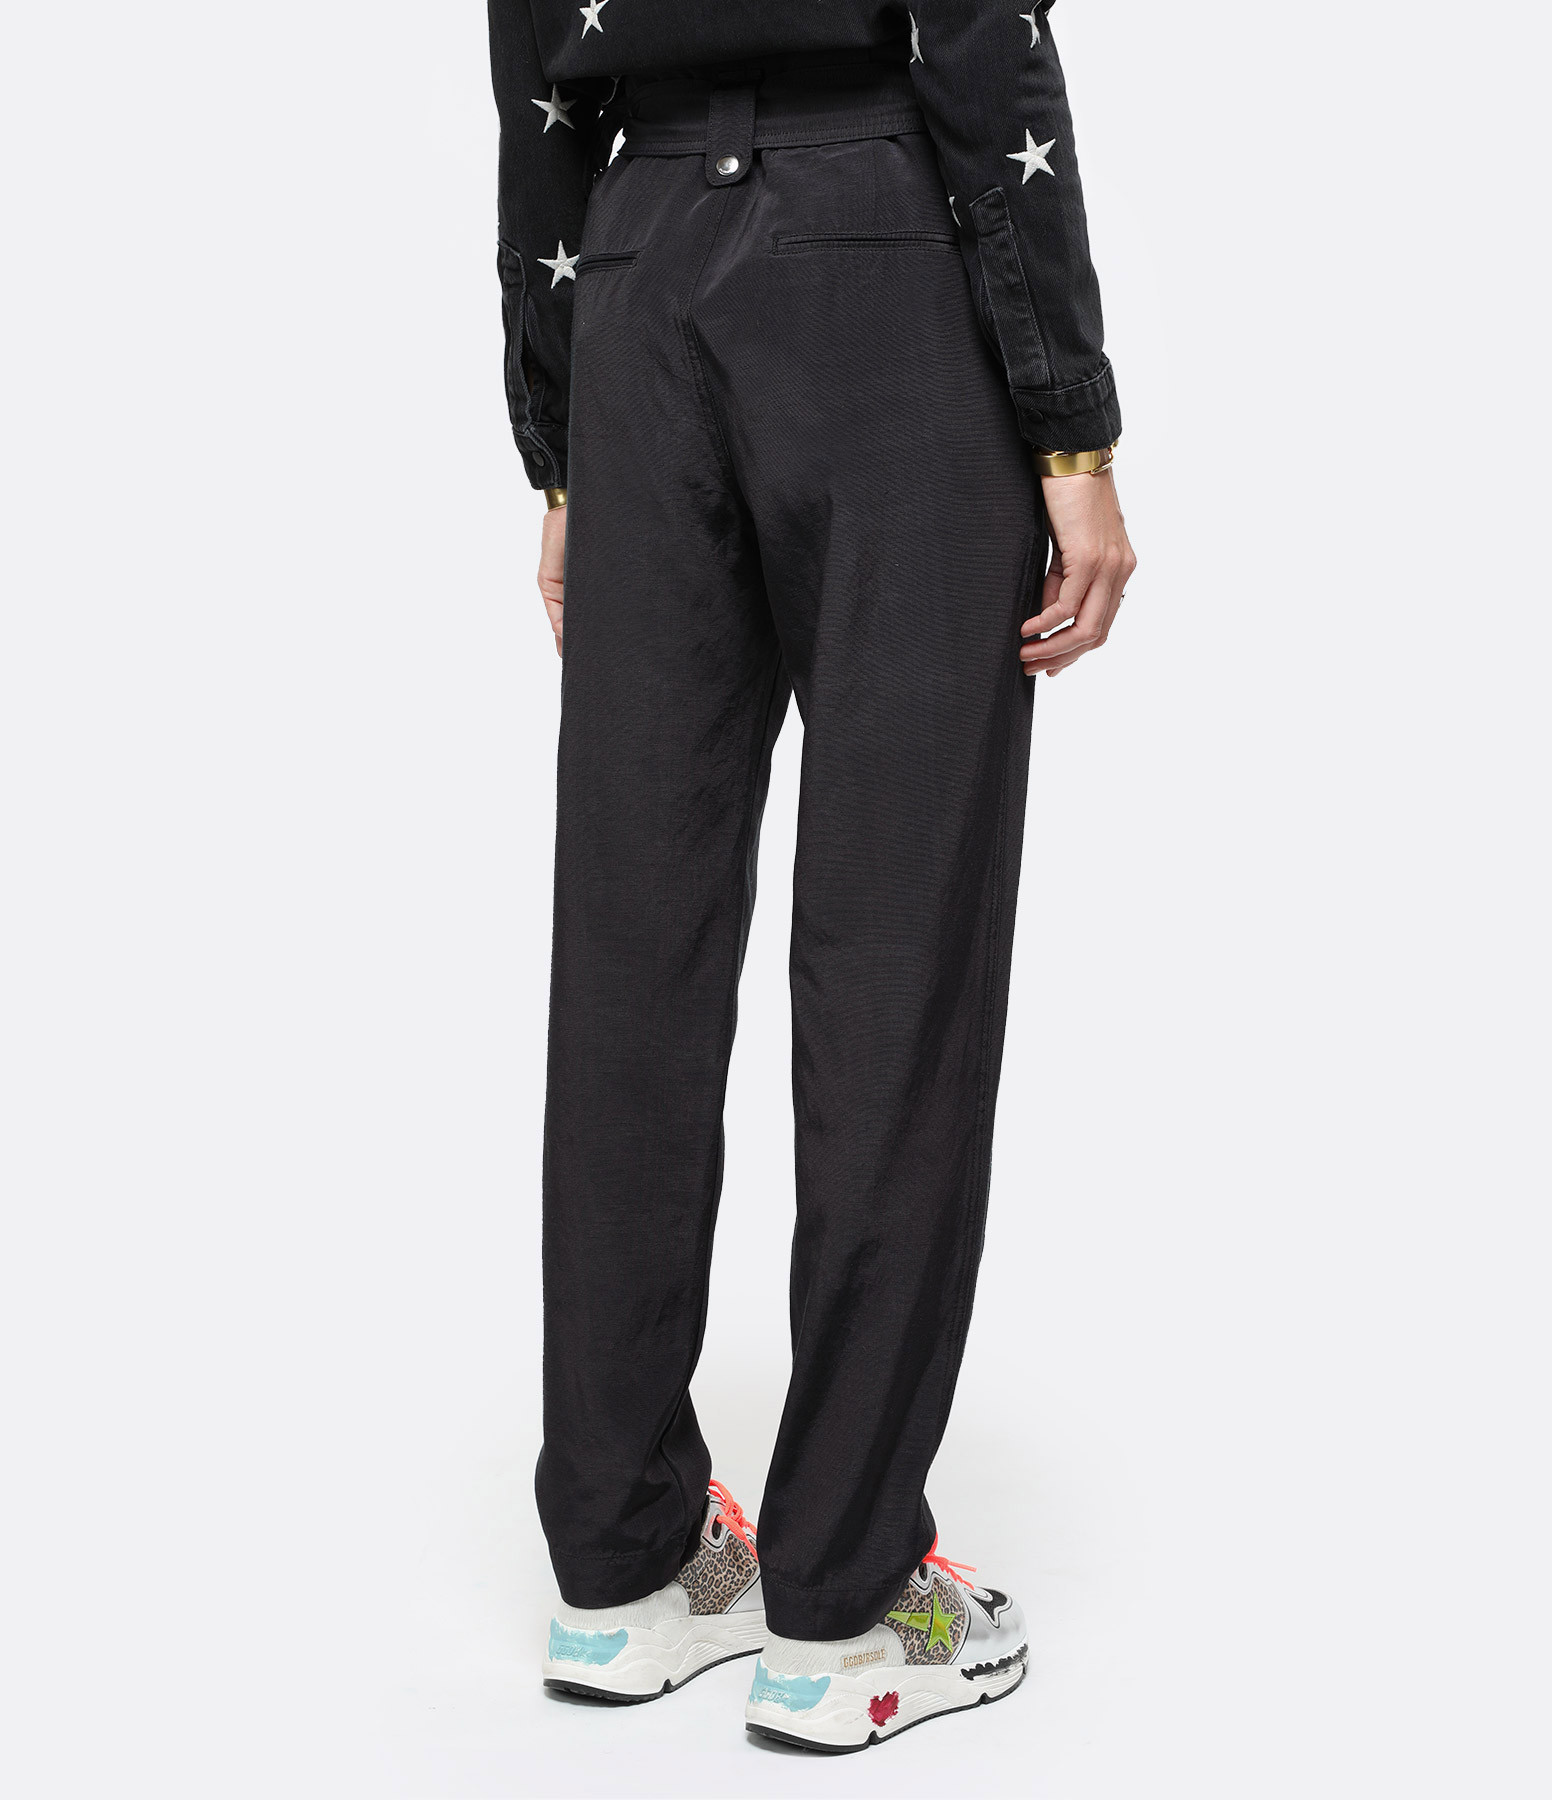 OVERLOVER - Pantalon Jesse Noir